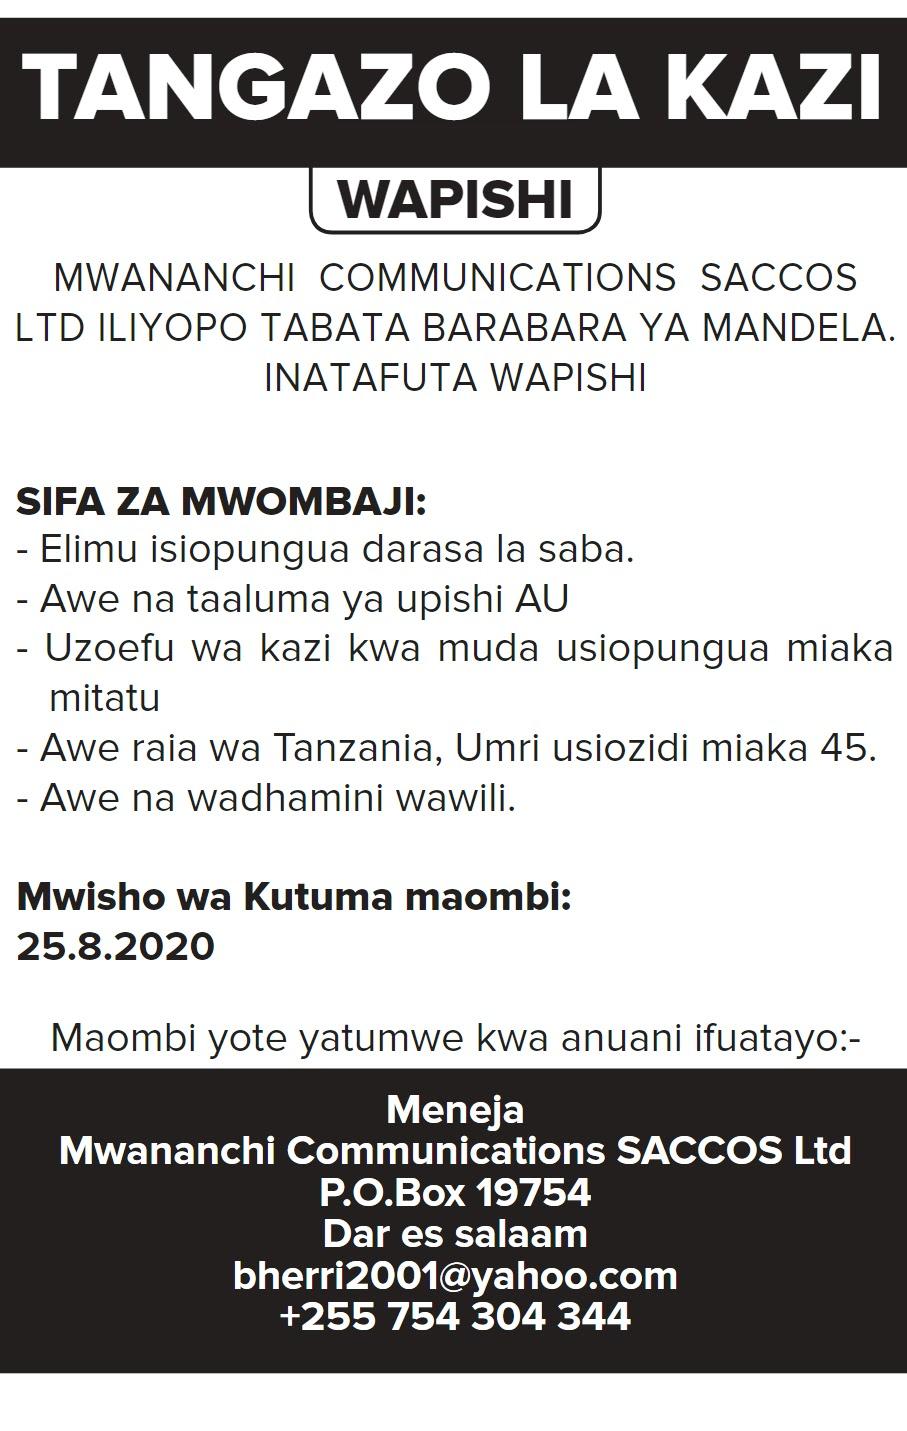 Job Opportunity at Mwananchi Communications SACCOS Limited, Cook (Wapishi)